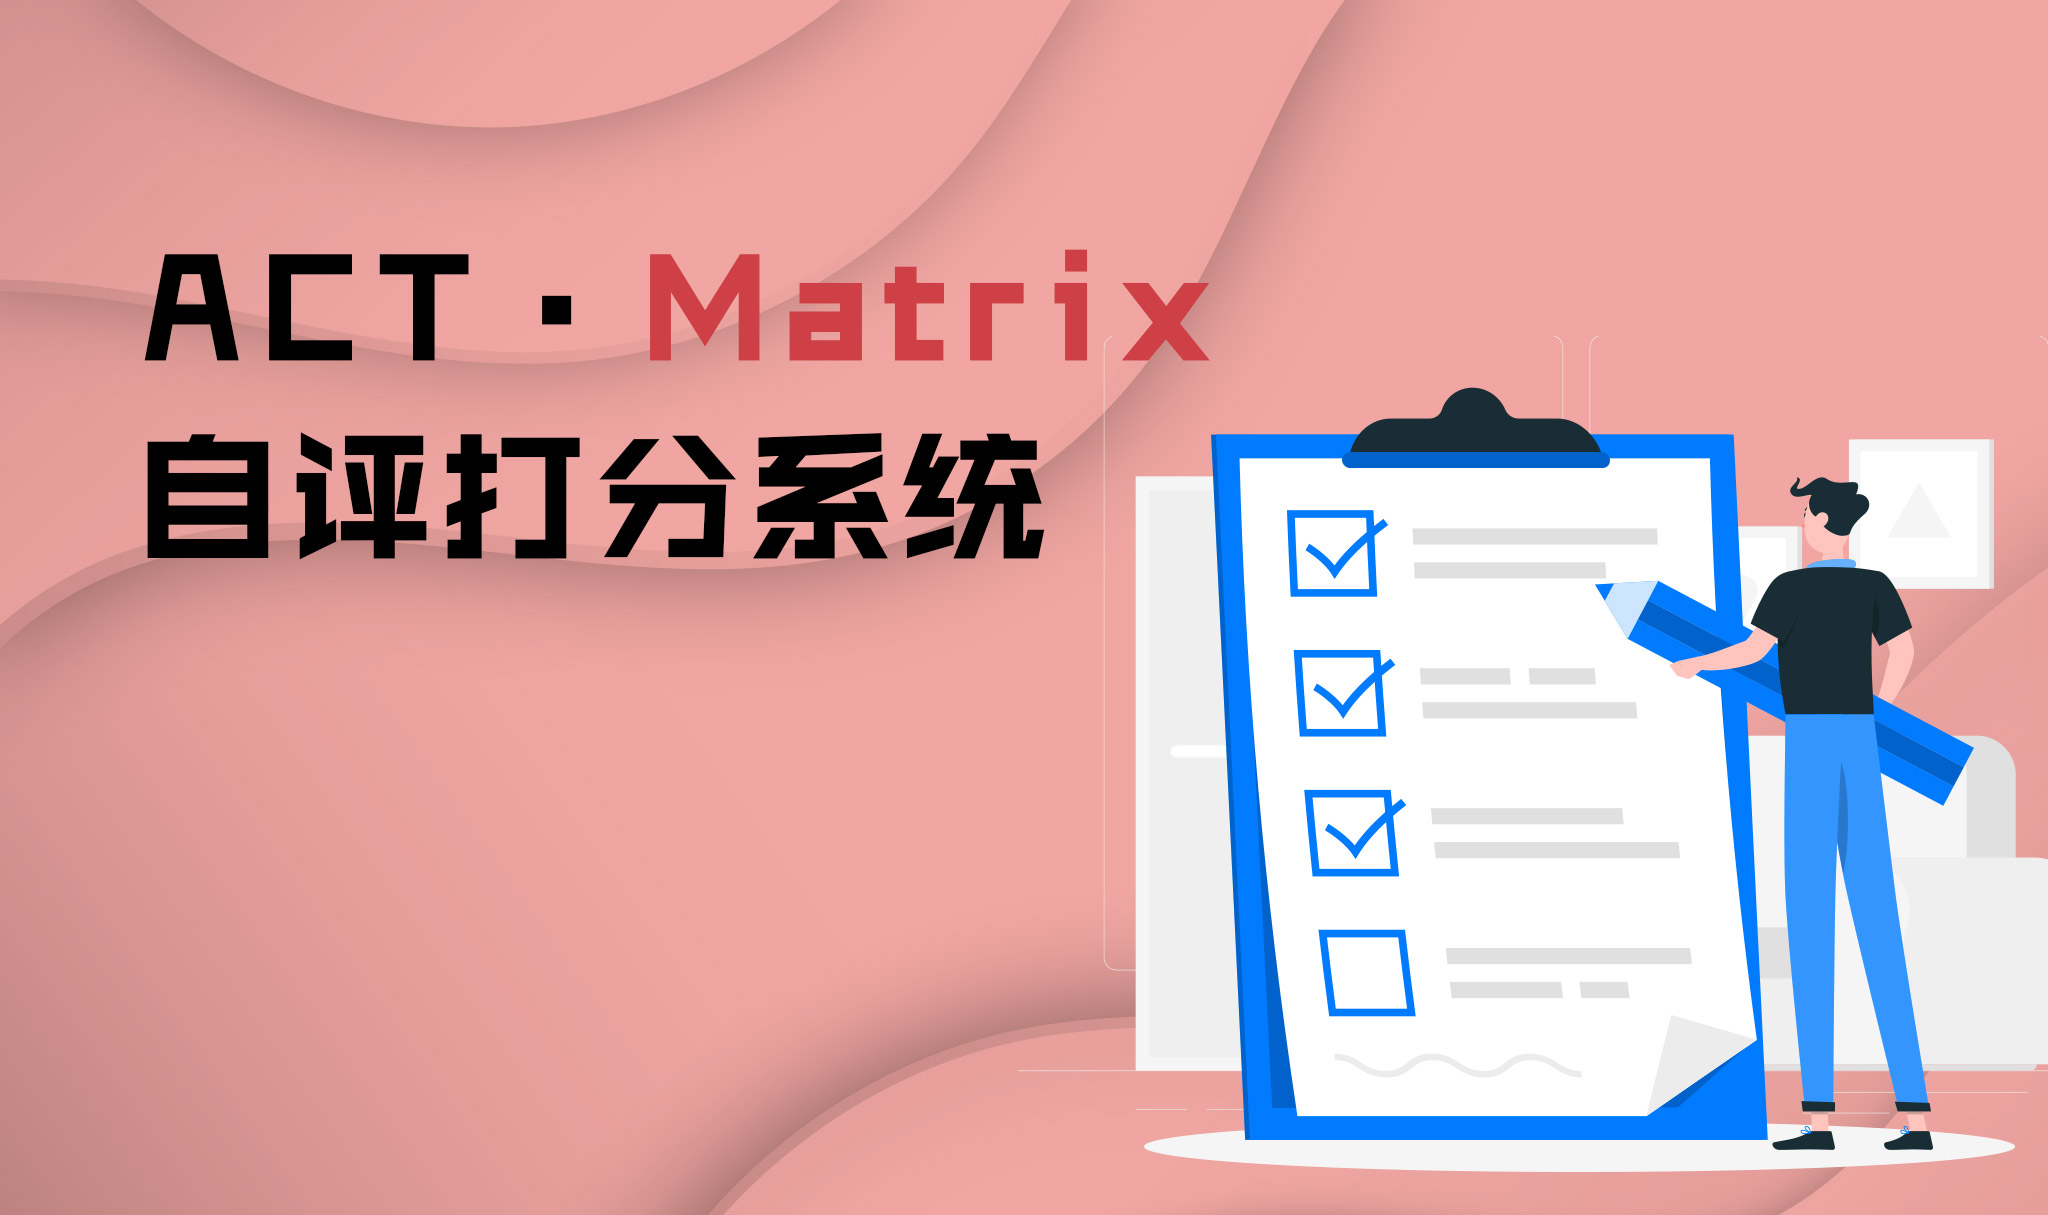 ACT Matrix 自评打分系统